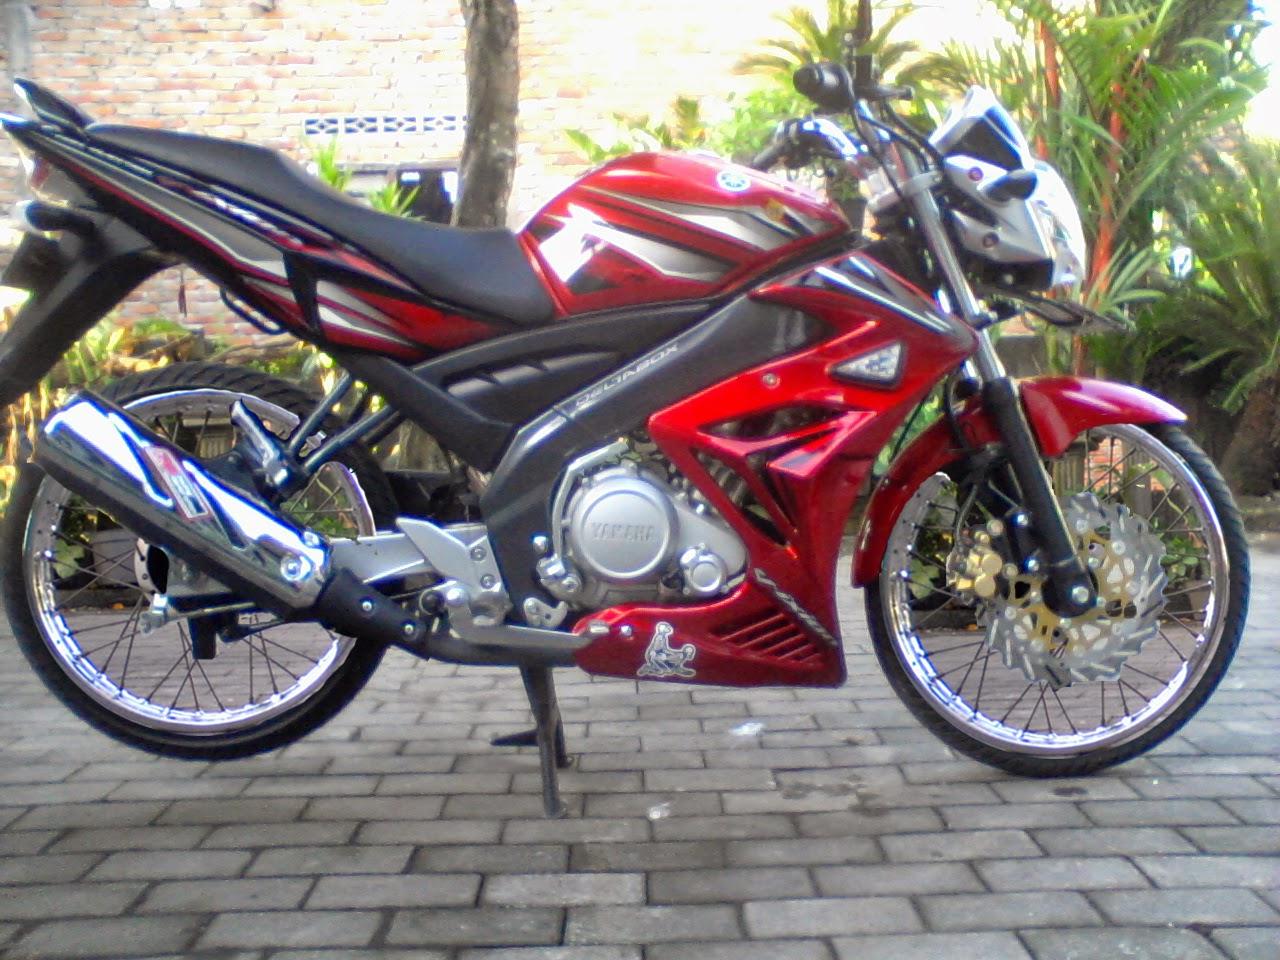 Modifikasi Motor Yamaha 2016: Modifikasi Yamaha Vixion